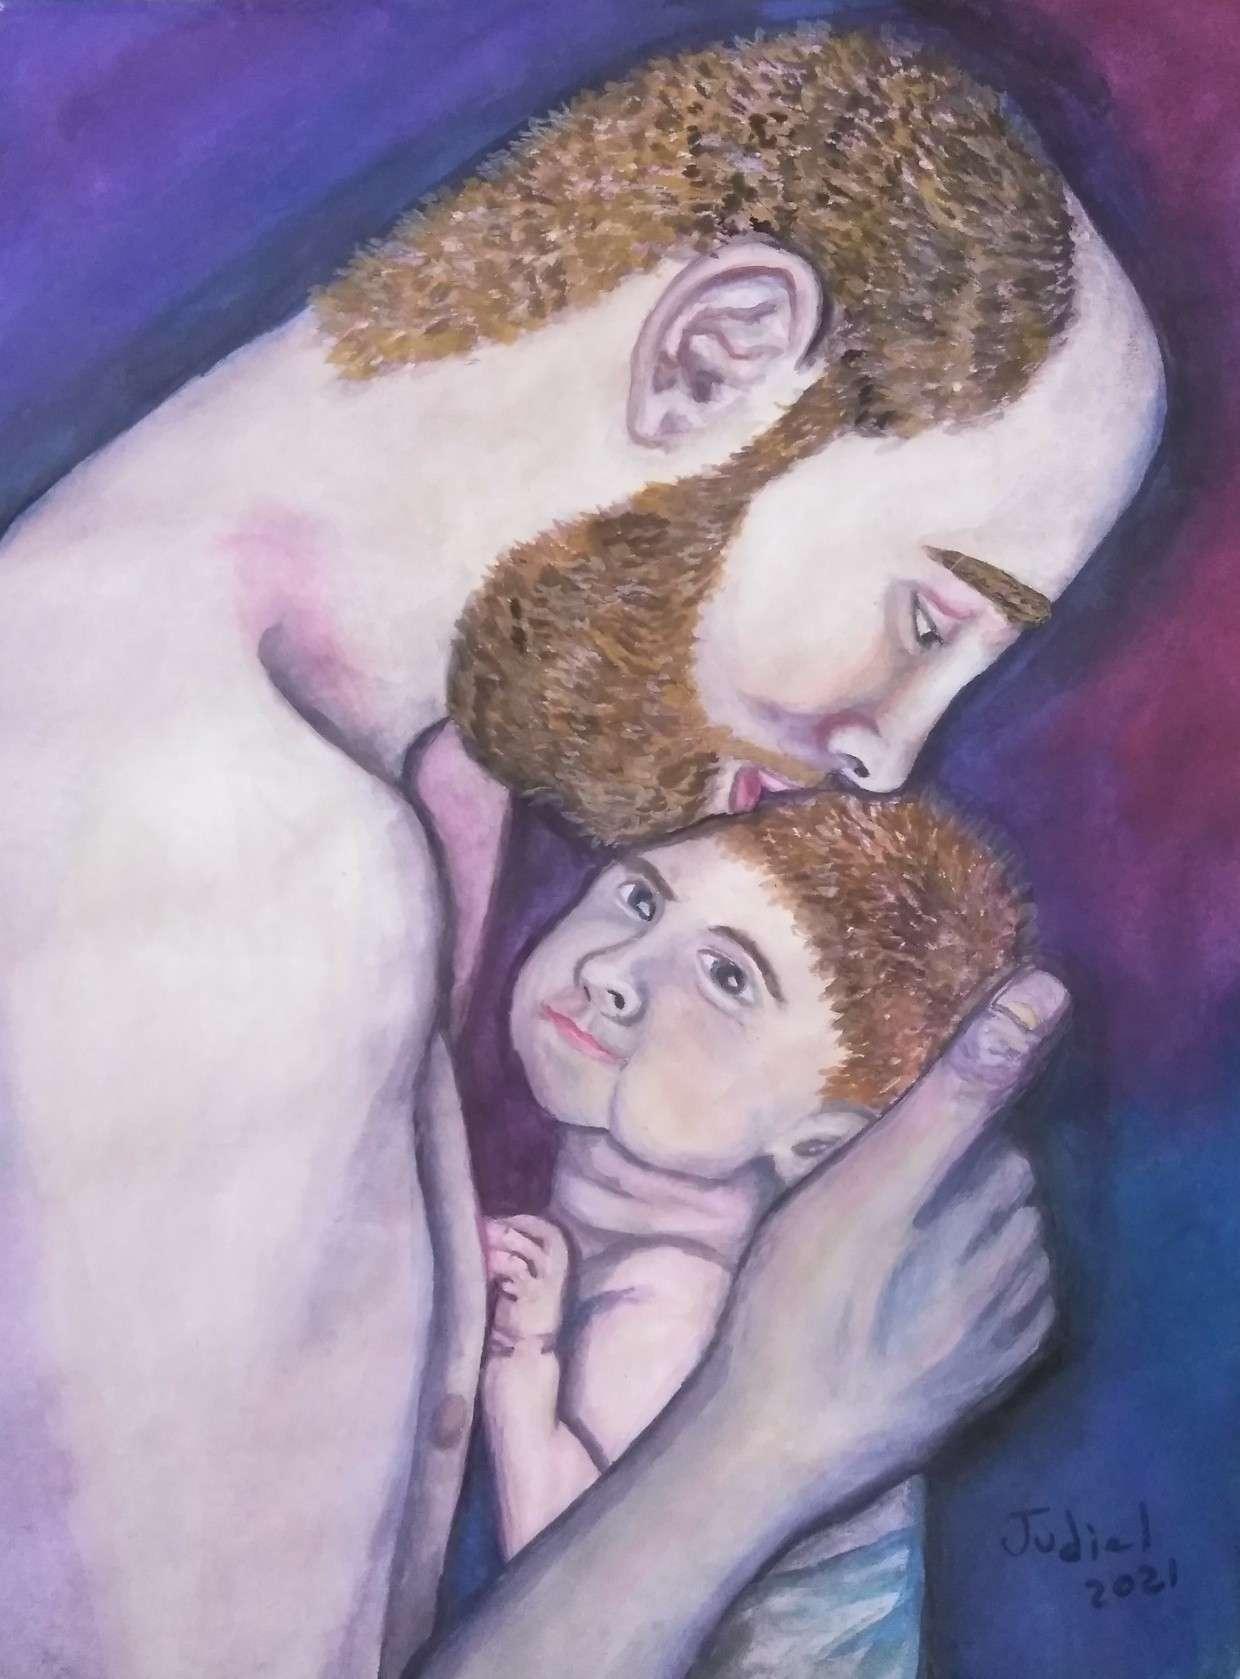 Obra: El beso del padre